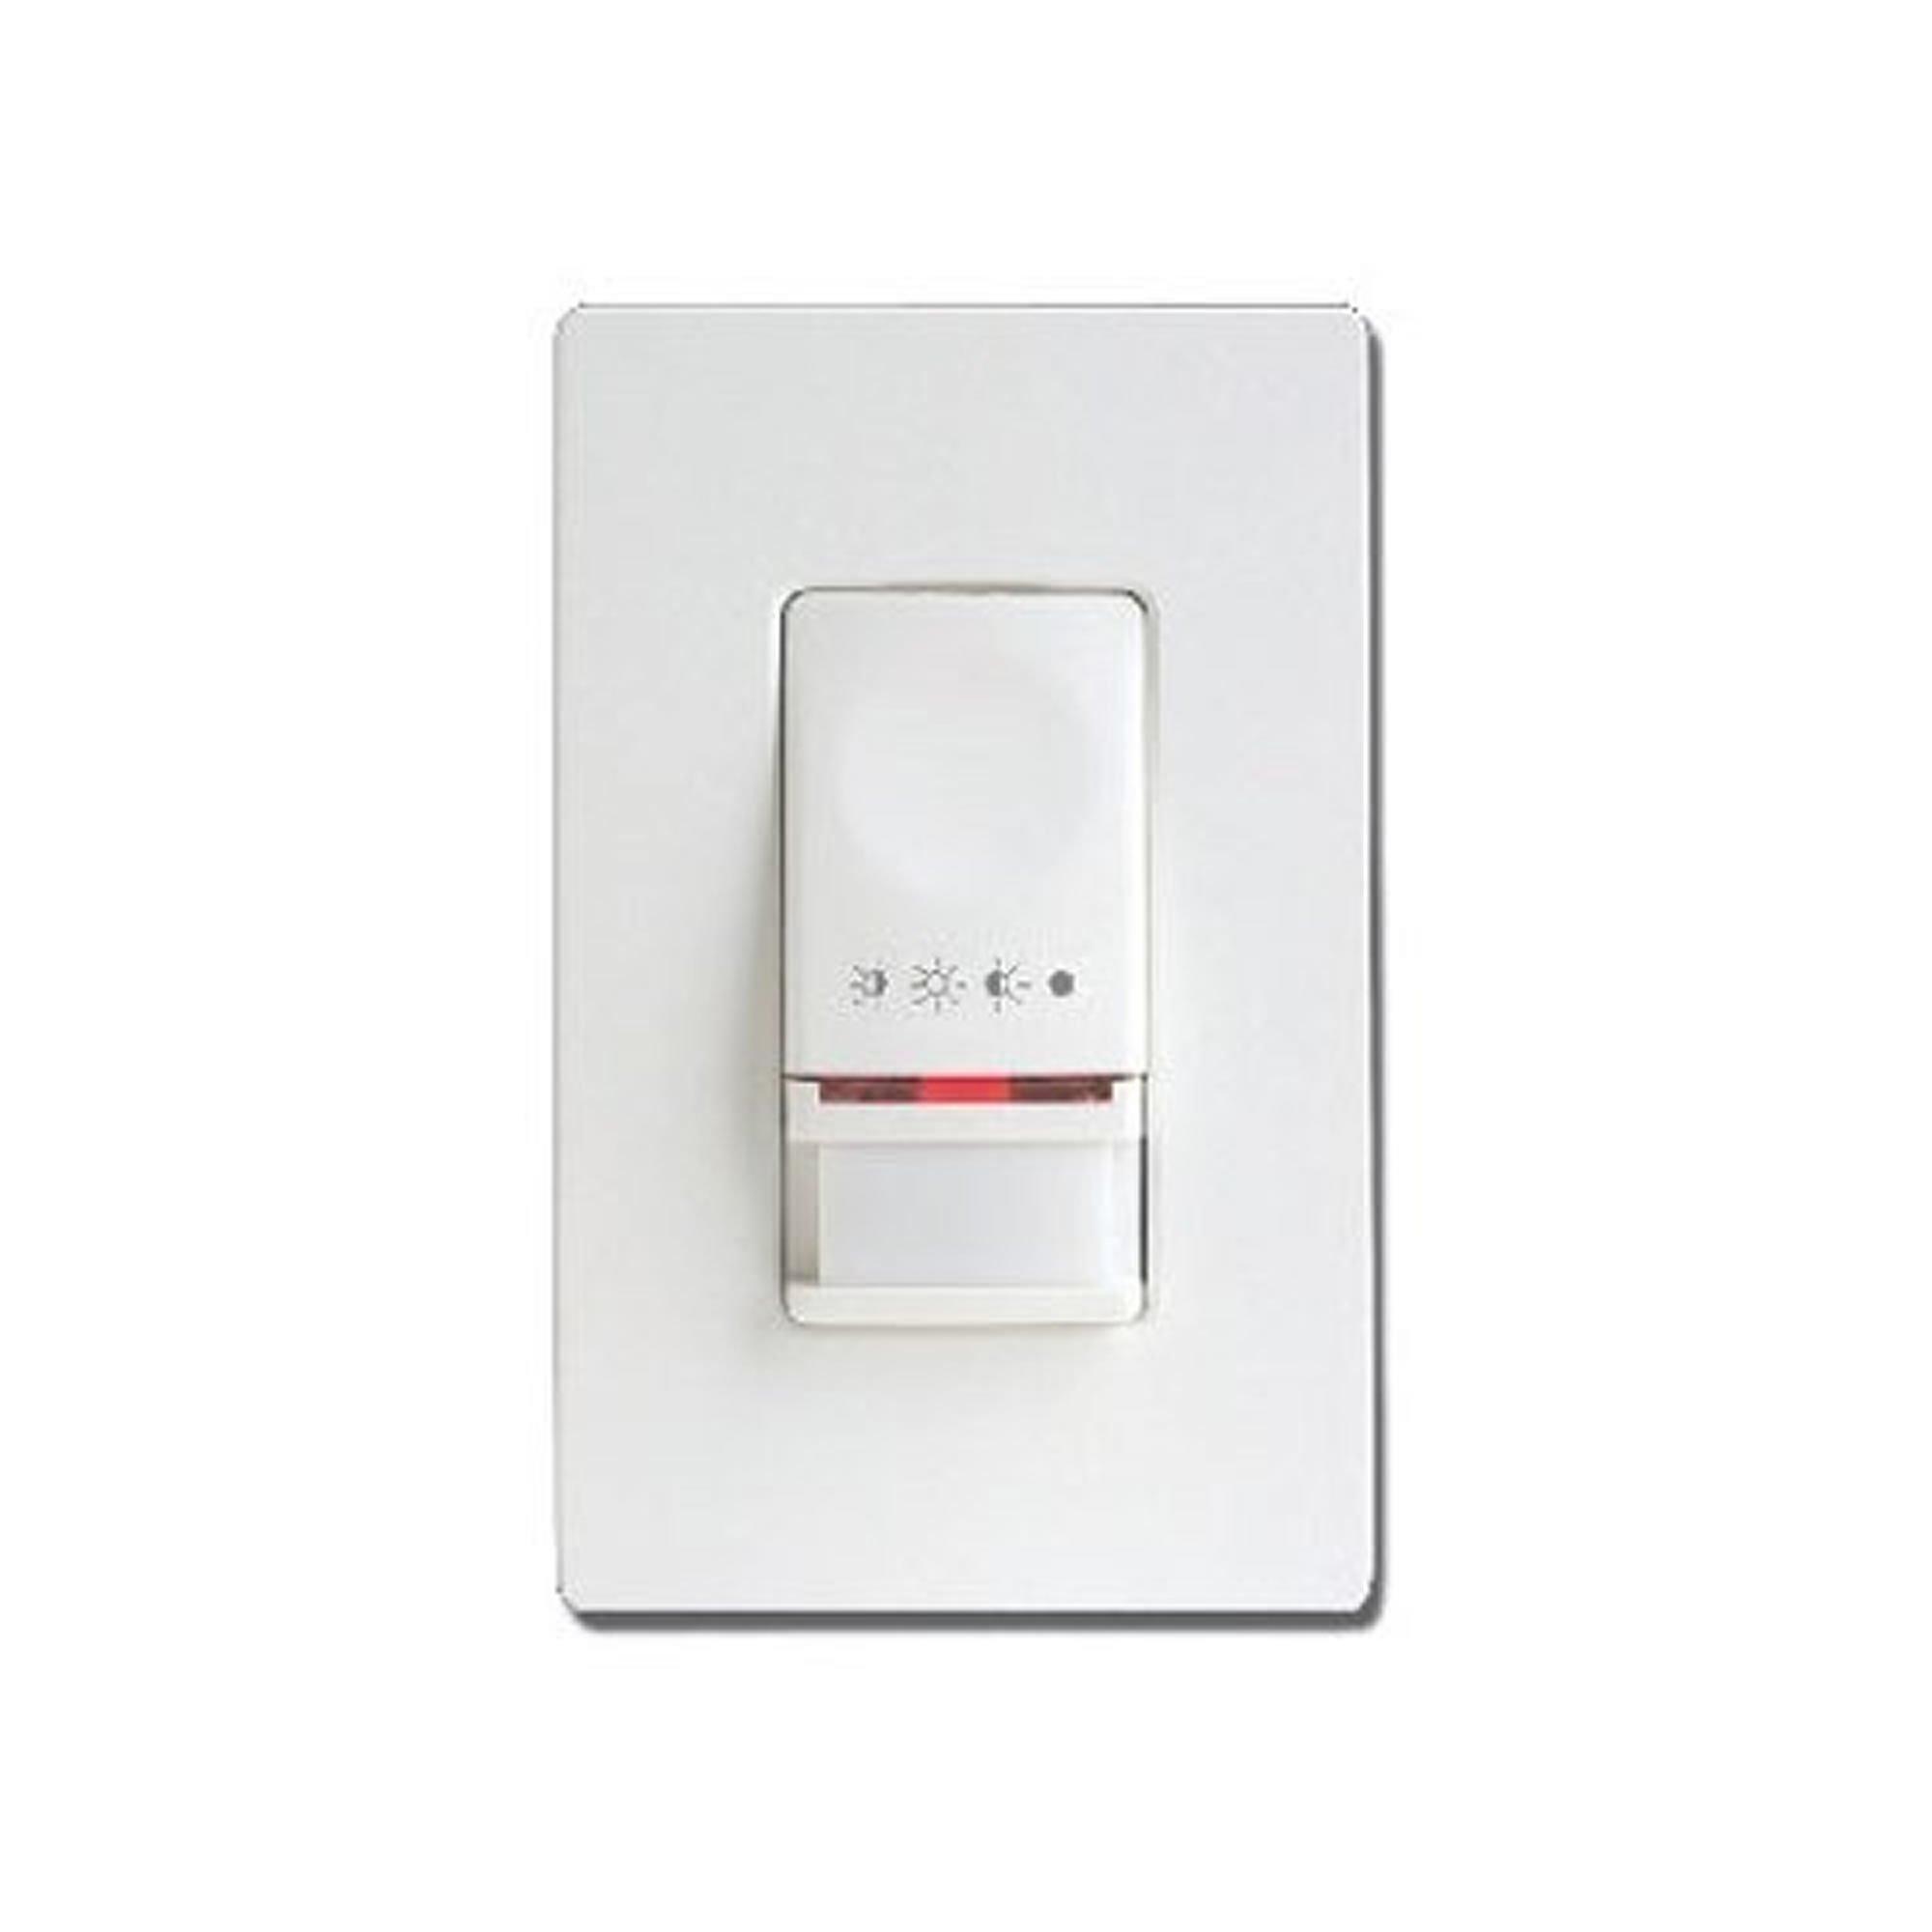 Cooper Controls OSW-P-0451-MV-W Greengate 120-277-Volt Single-Level PIR Wall Switch Sensor, White Finish